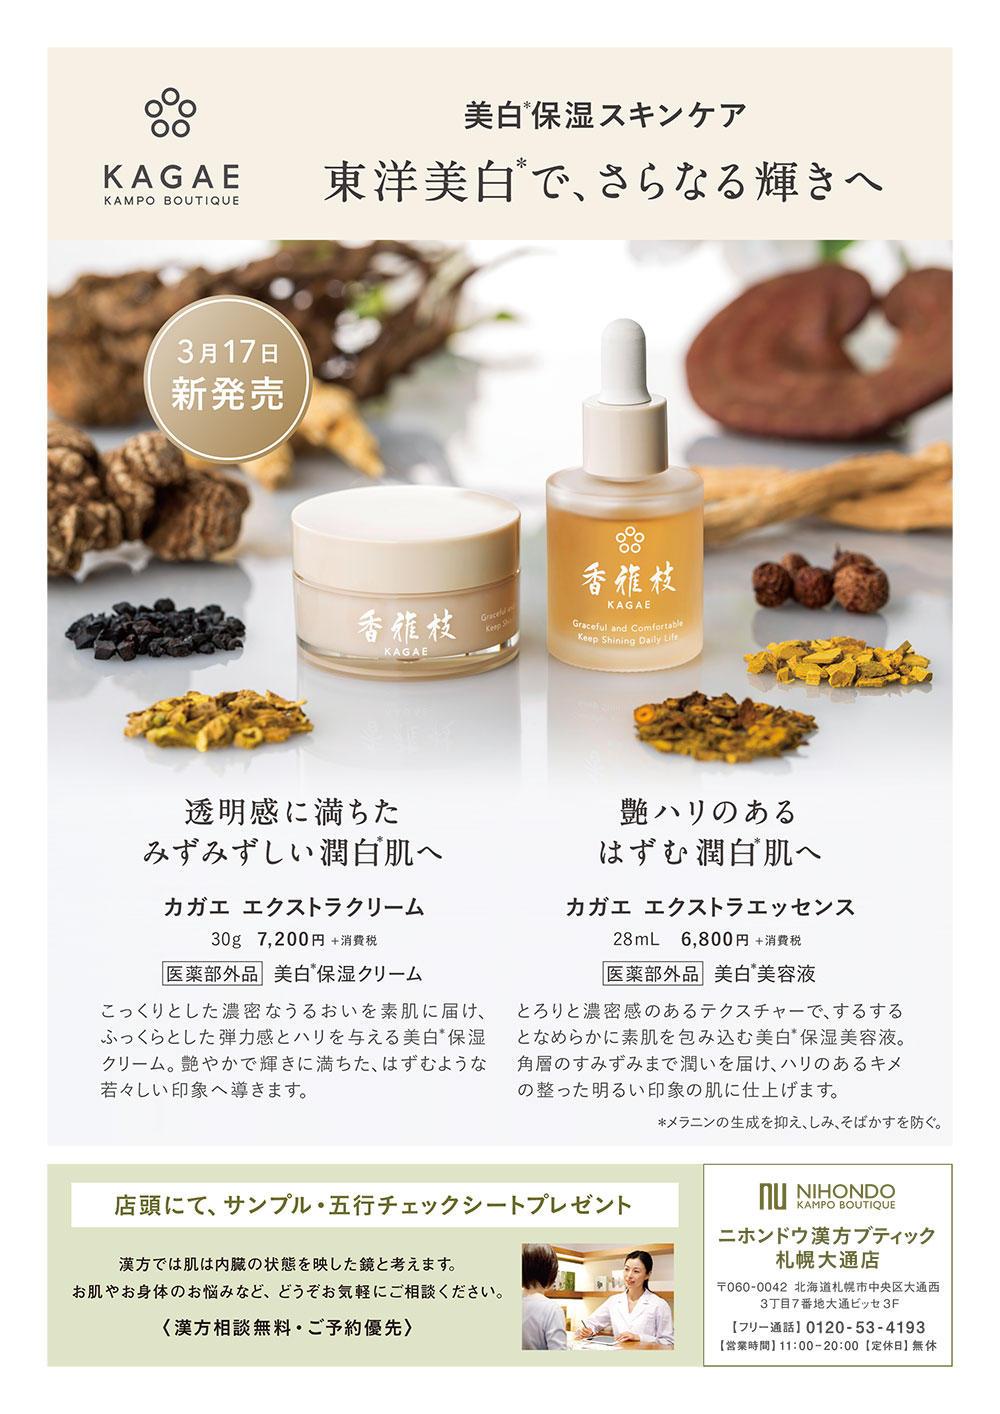 https://www.odori-bisse.com/info/nihondoh_180314_img1.jpg